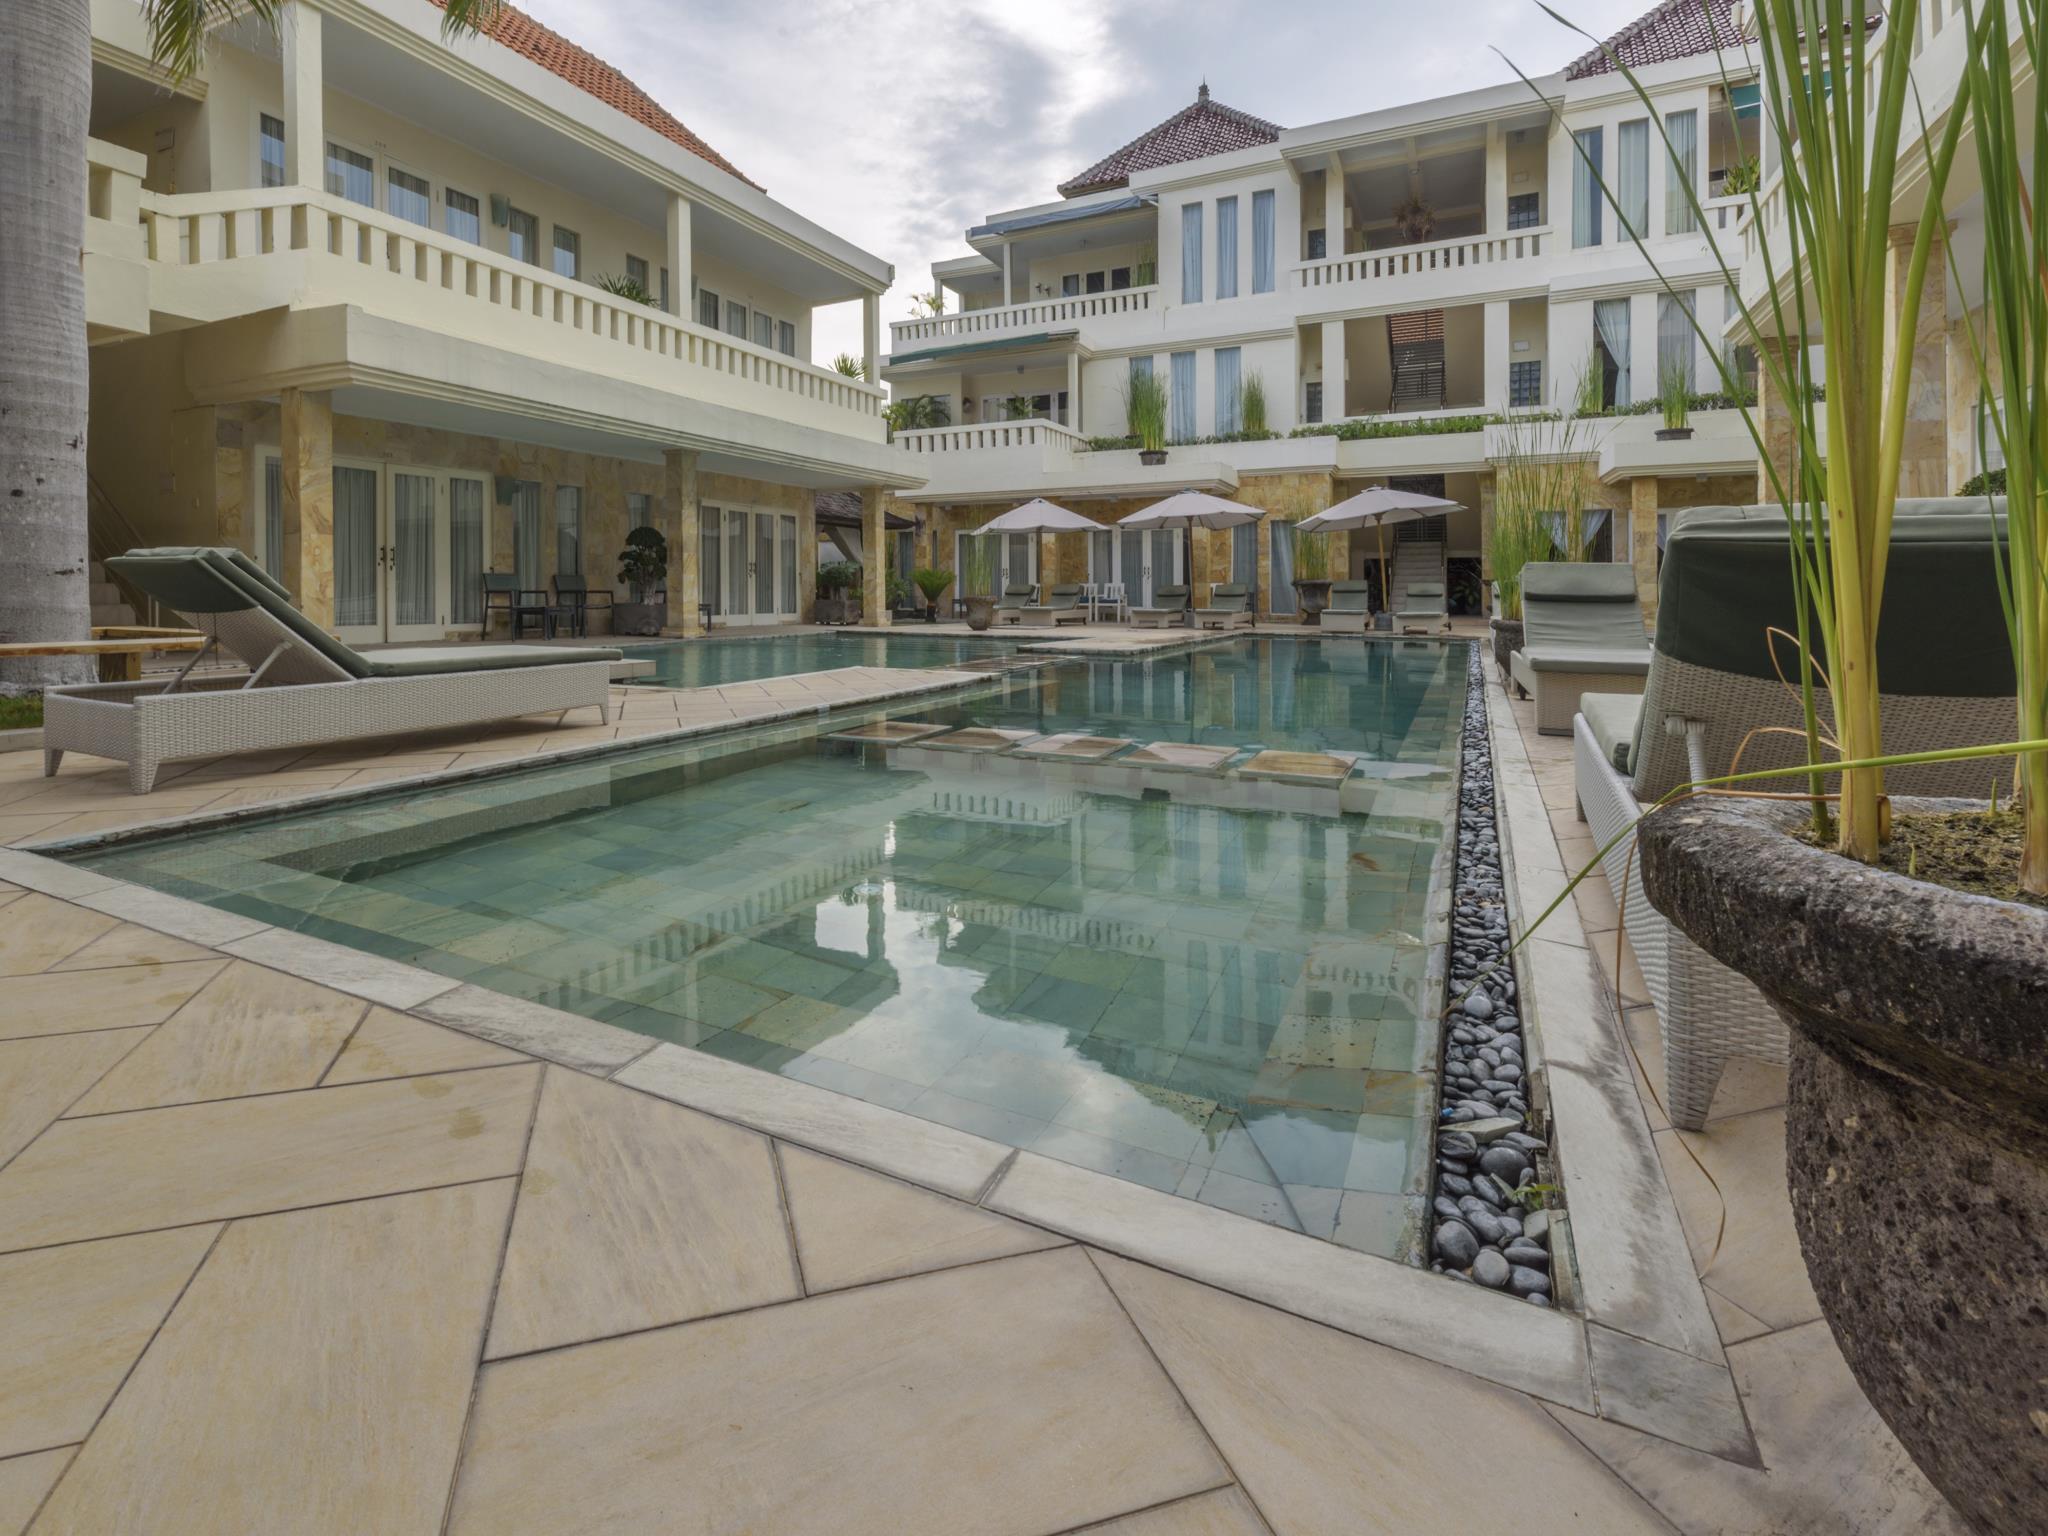 Bali Court Hotel & Apartment ホテル詳細